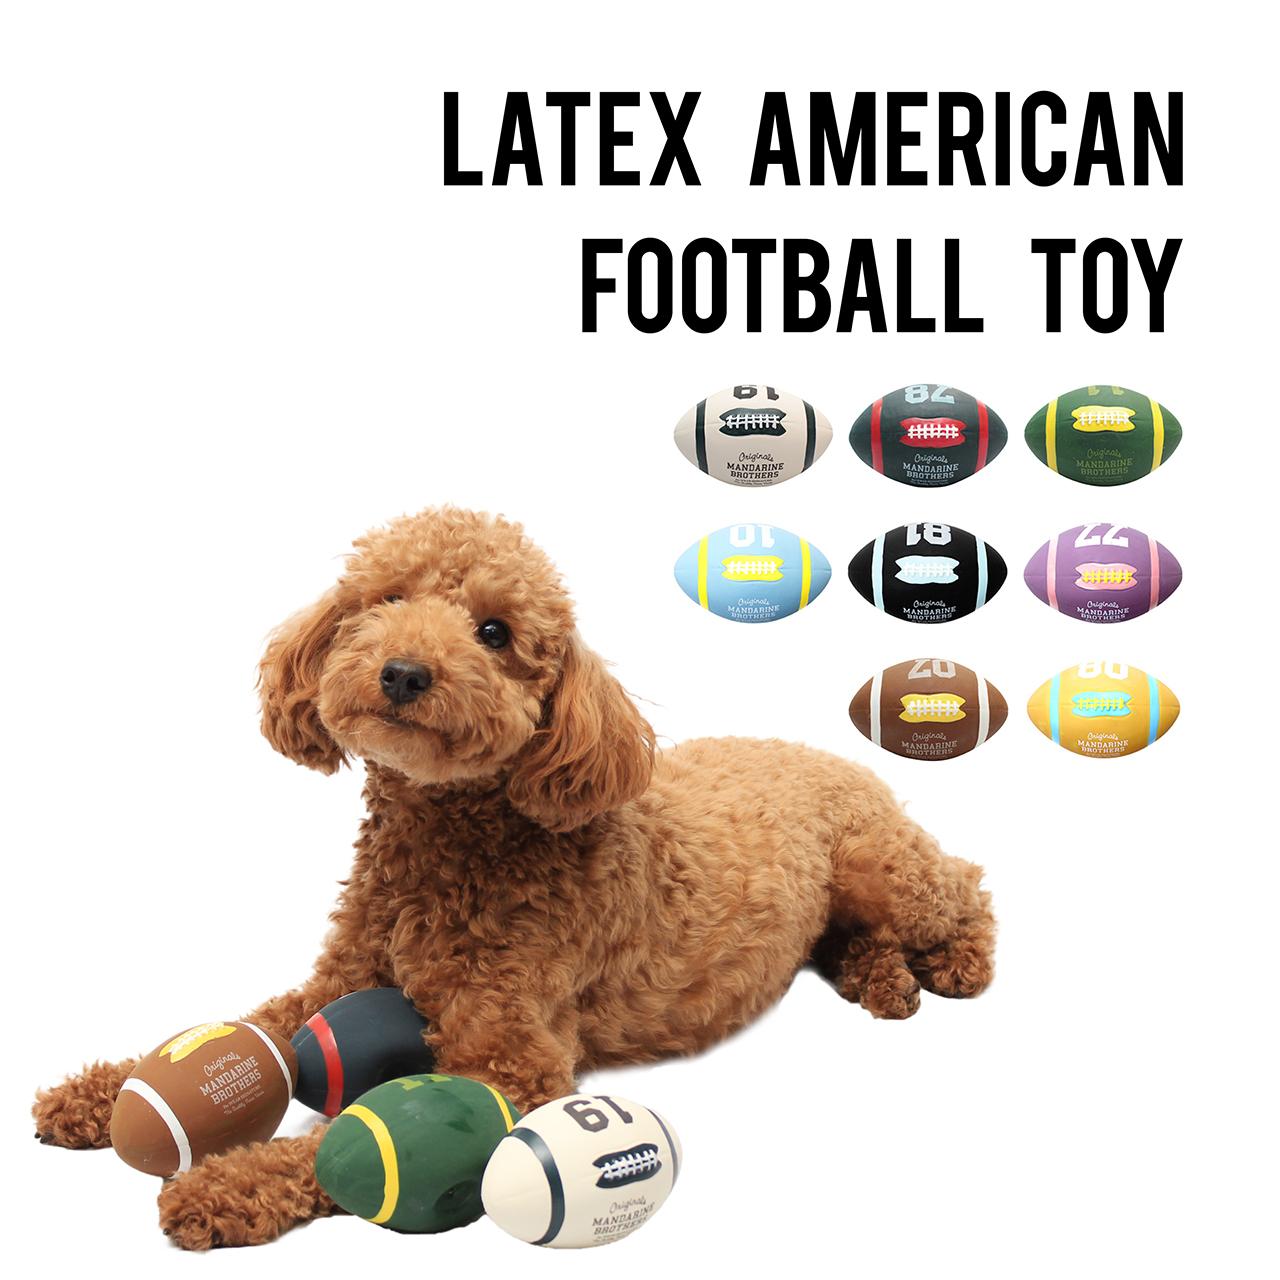 LATEX AMERICAN FOOTBALL TOY ラテックスアメリカンフットボールトイ